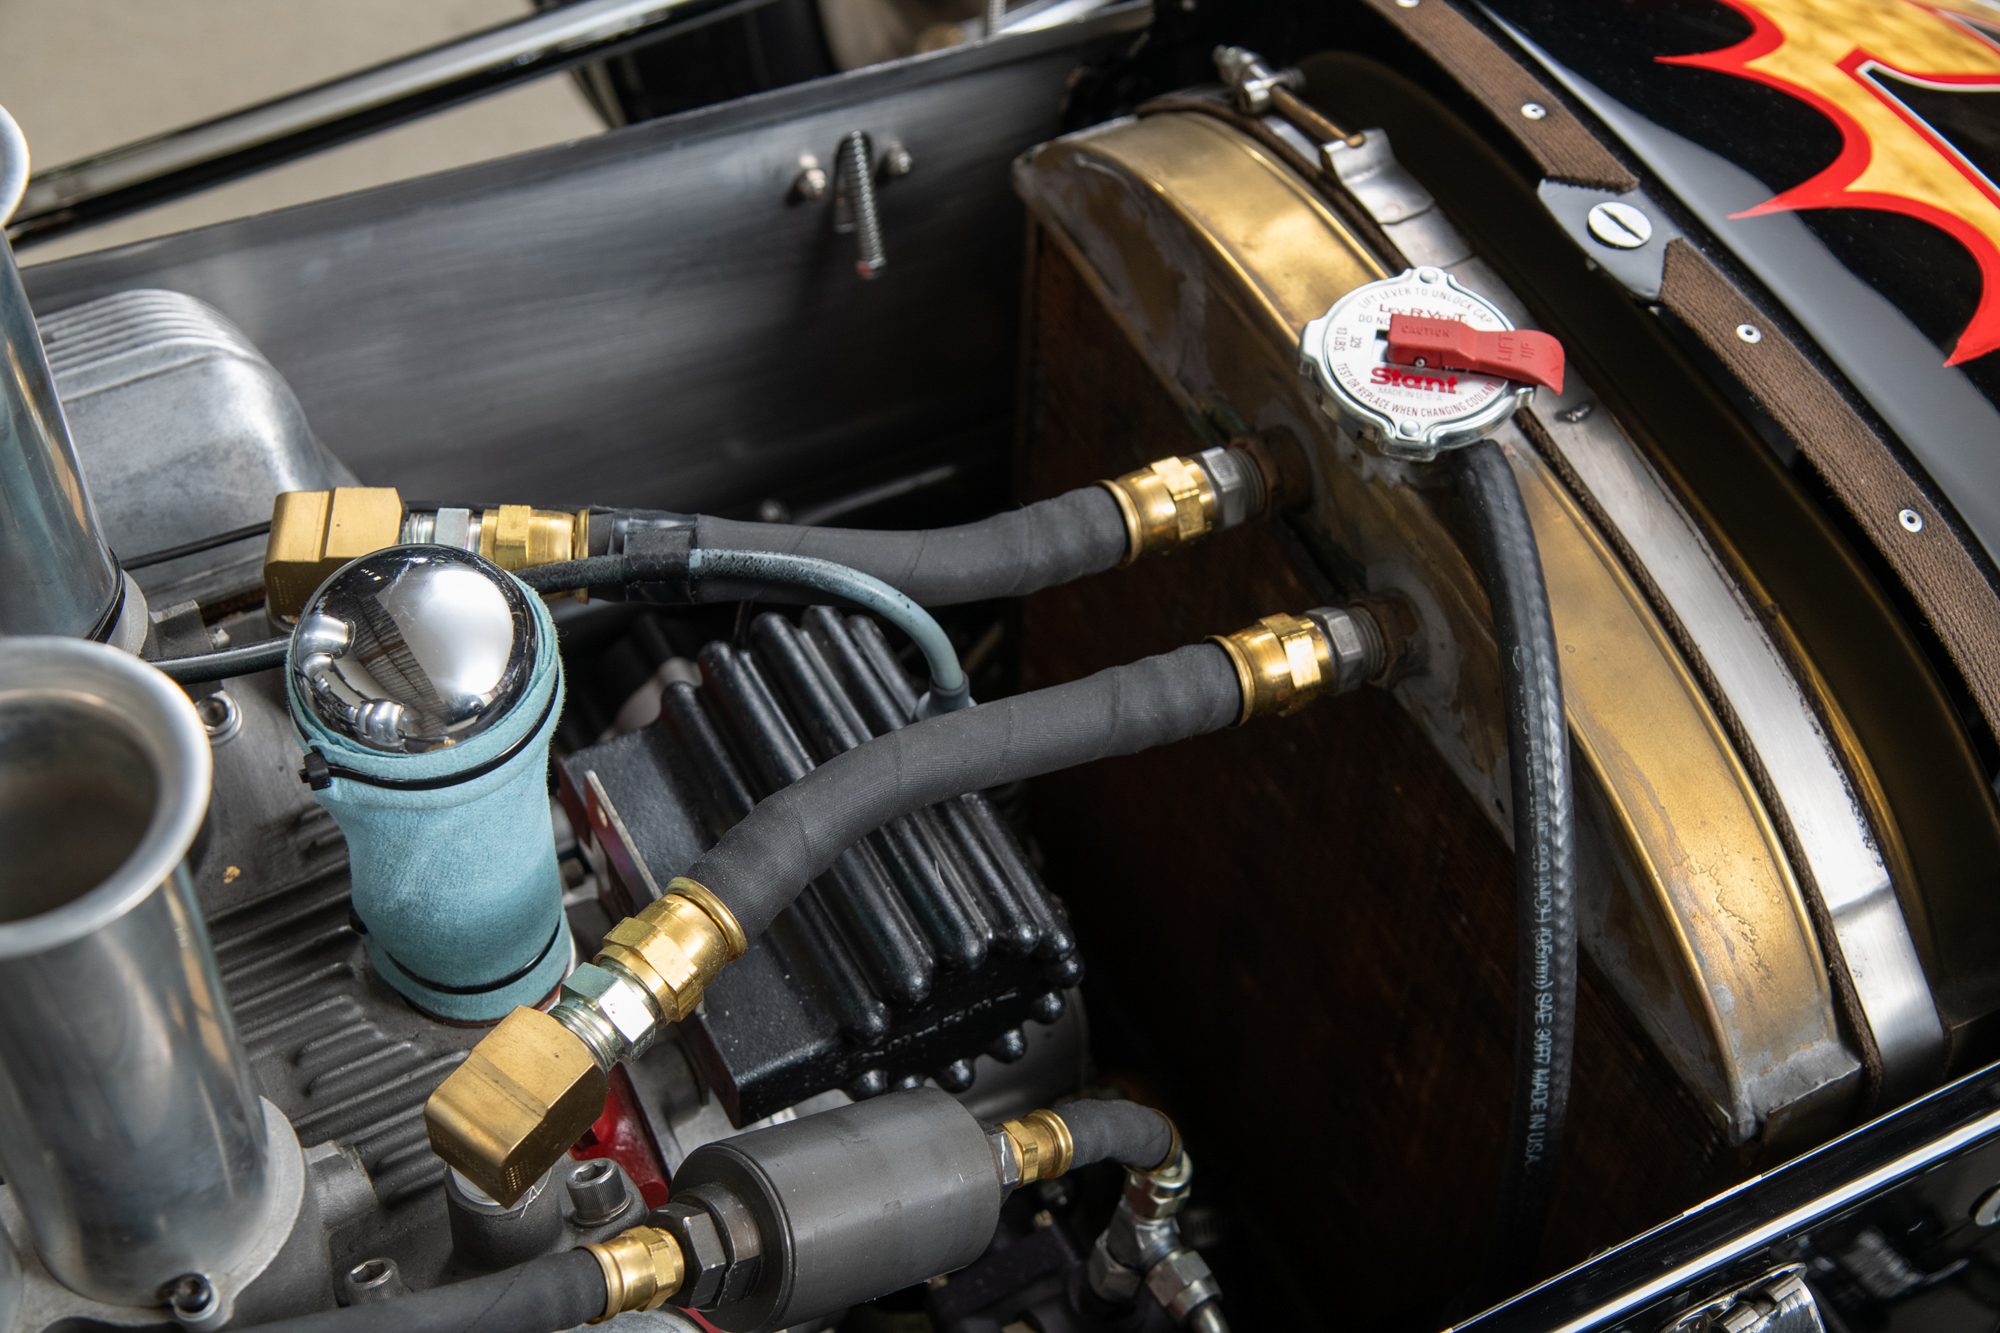 1965 Stapp Sprint Car , BLACK